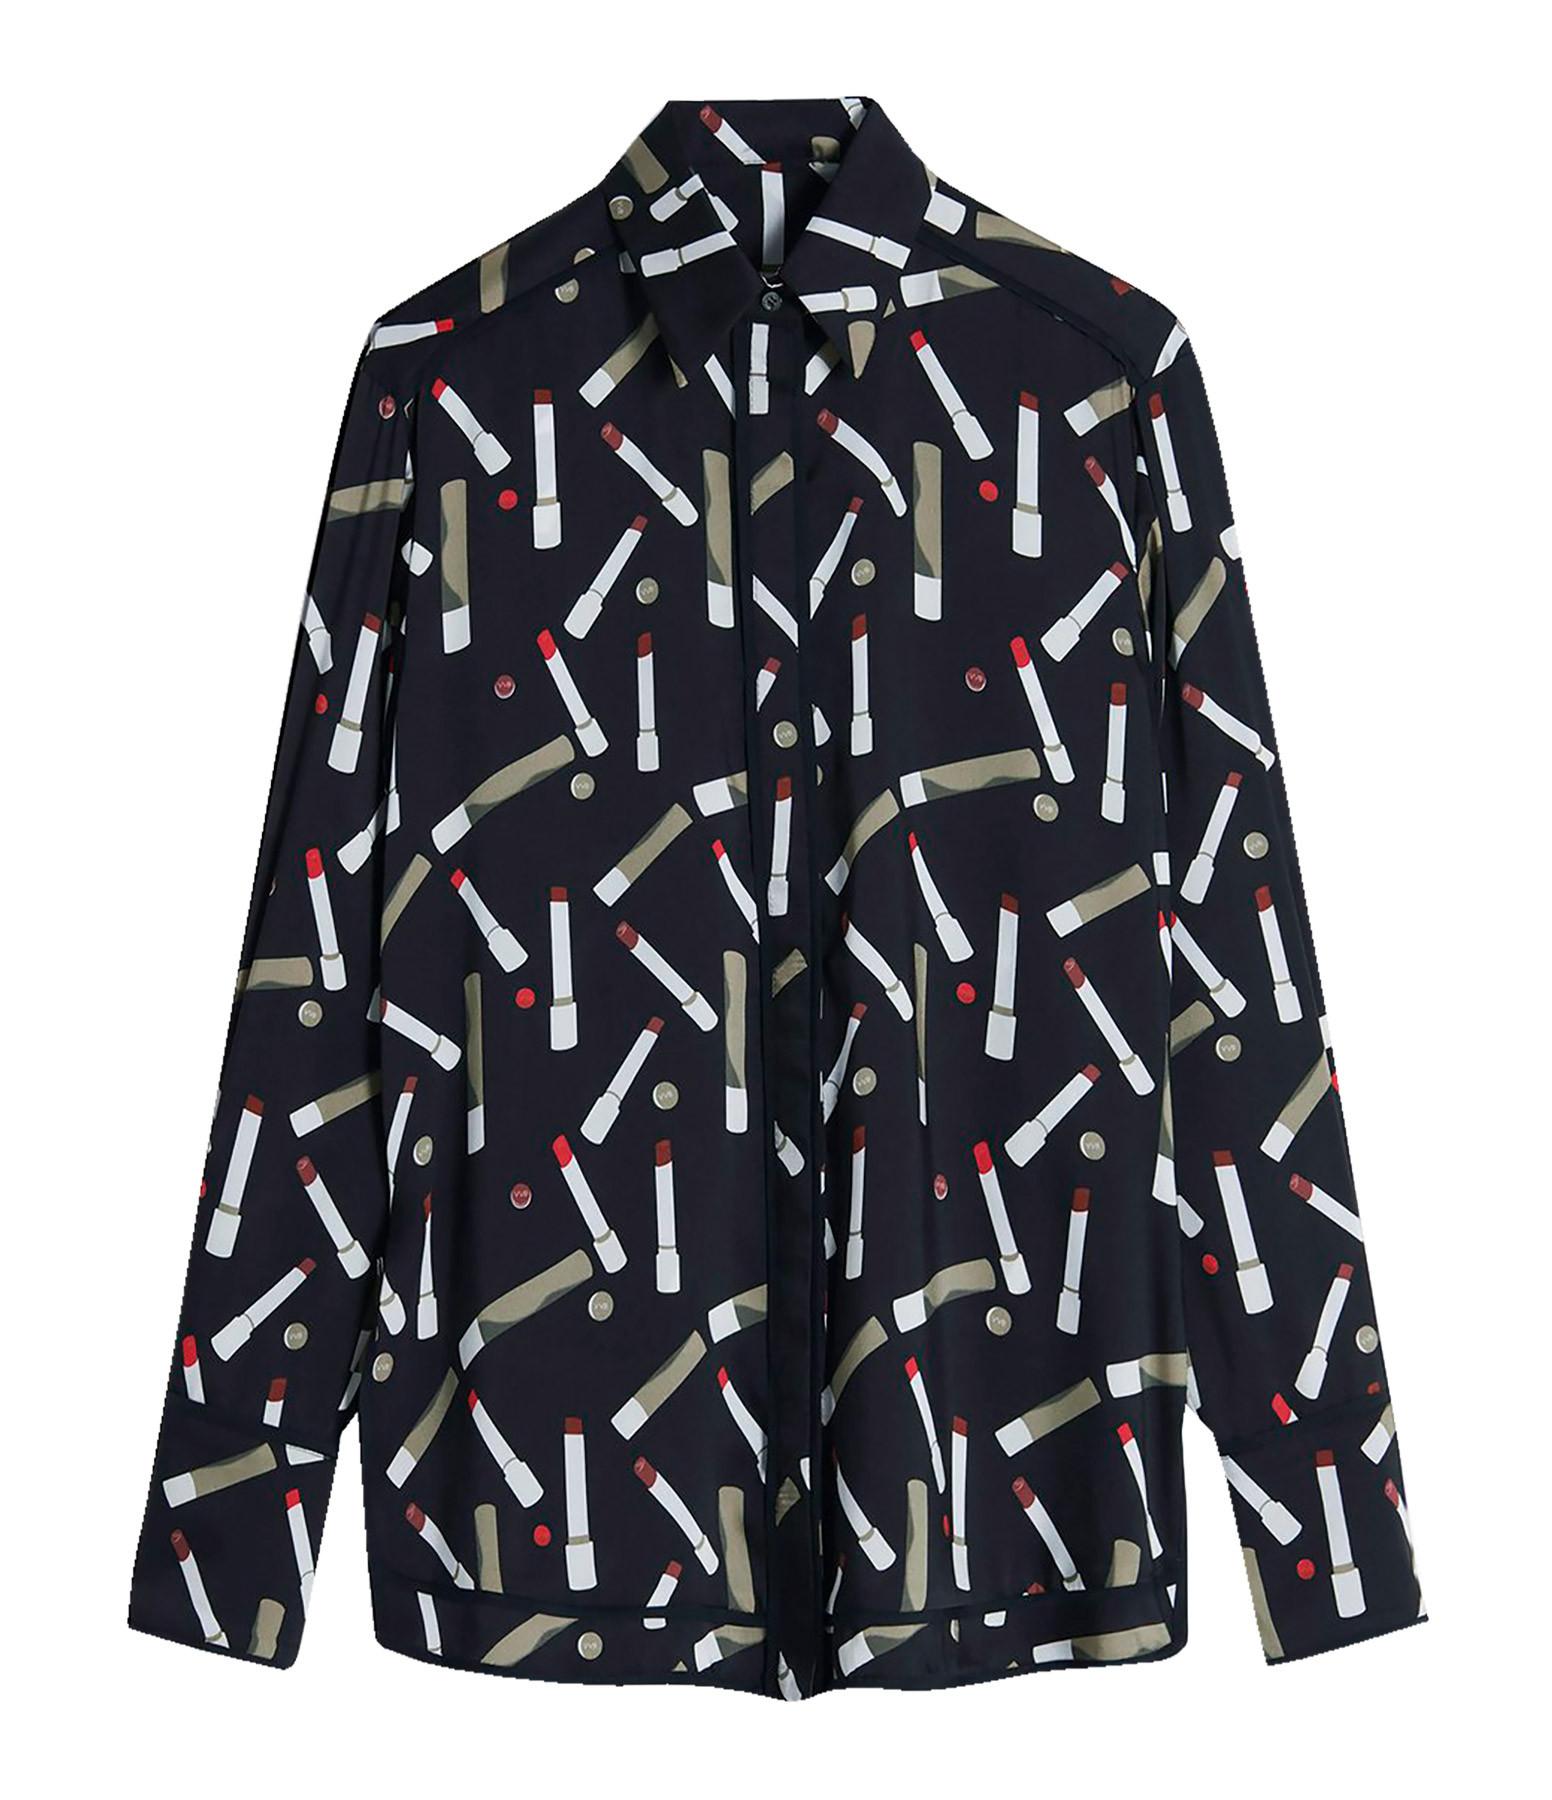 VICTORIA VICTORIA BECKHAM - Chemise Pyjama Imprimé Recyclé Noir